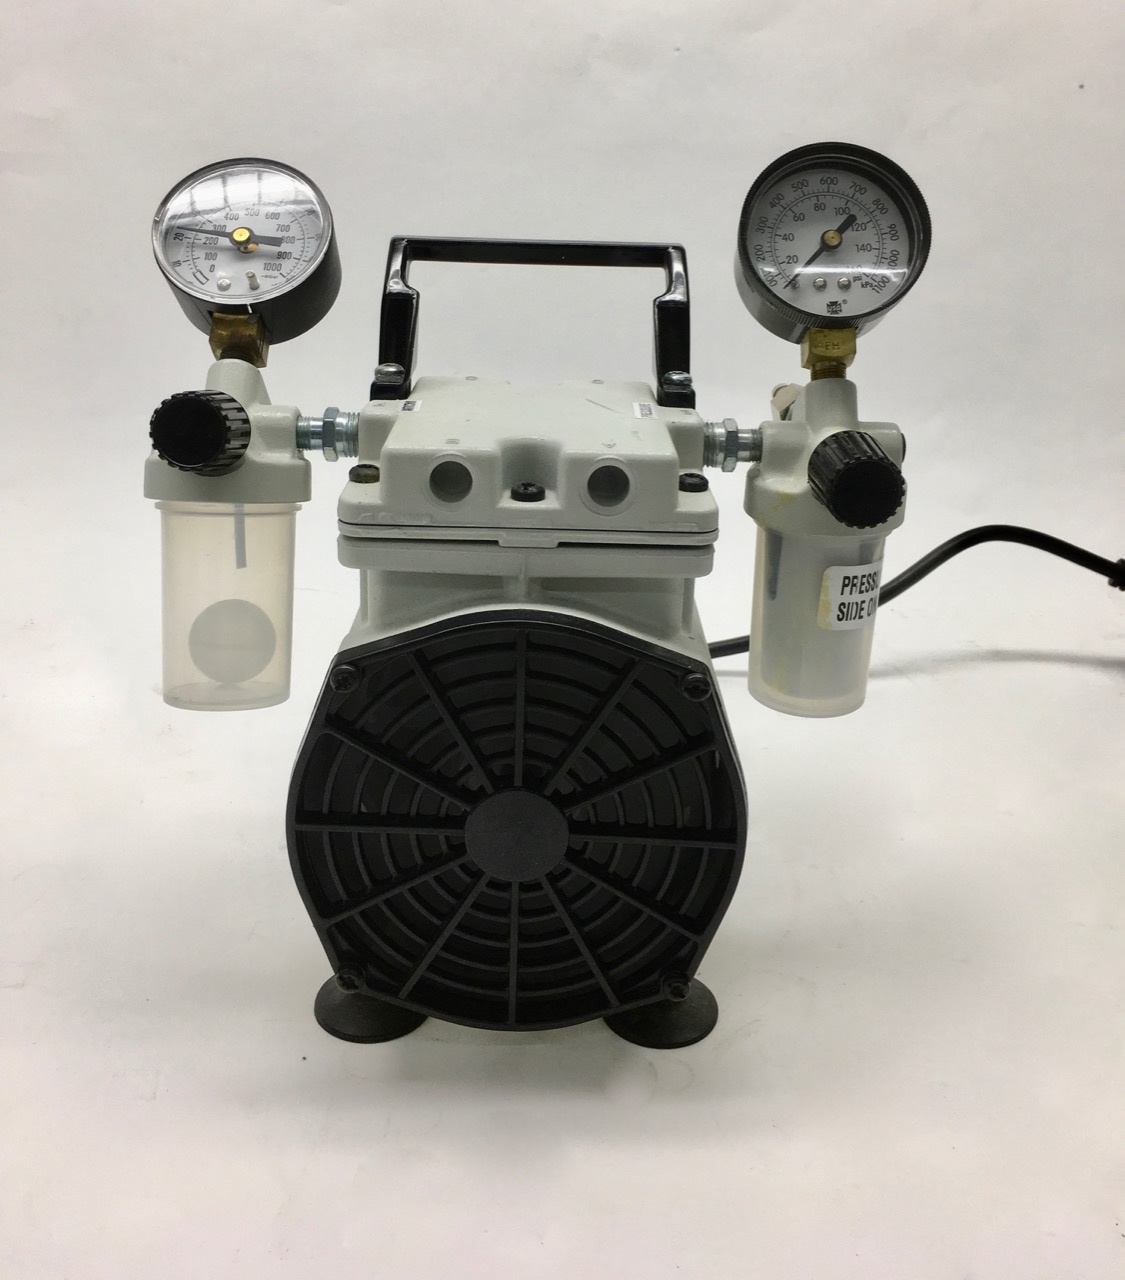 Welch Welch WOB-L PRESS/VAC DRY PUMP 2 2522Z-02 Vakuumpumpe